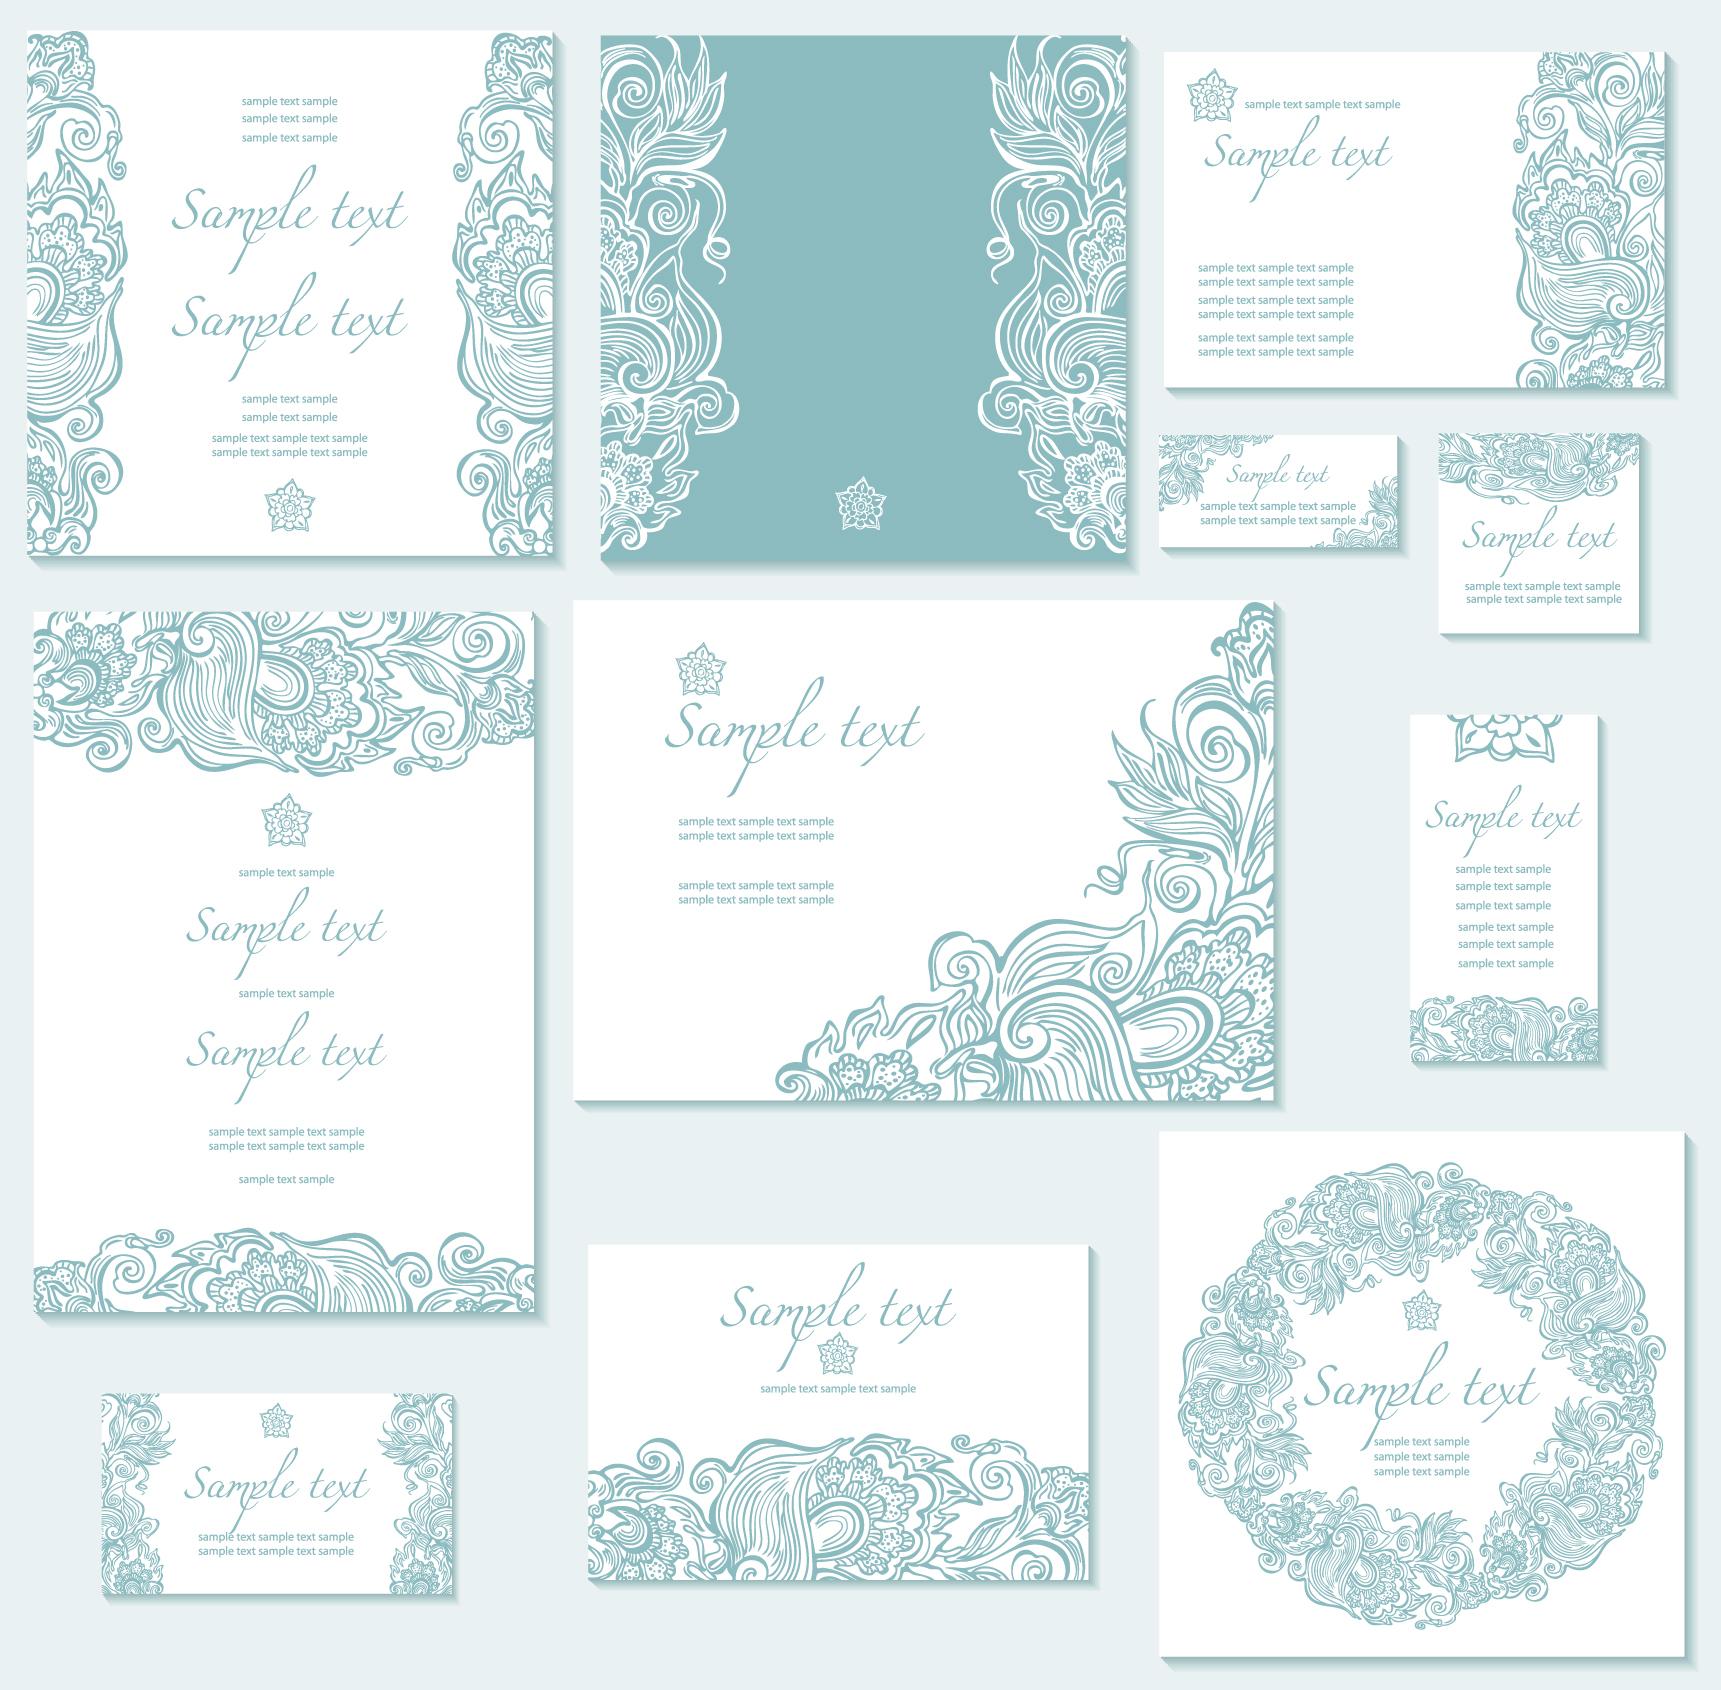 14 Free Wedding Vectors Images